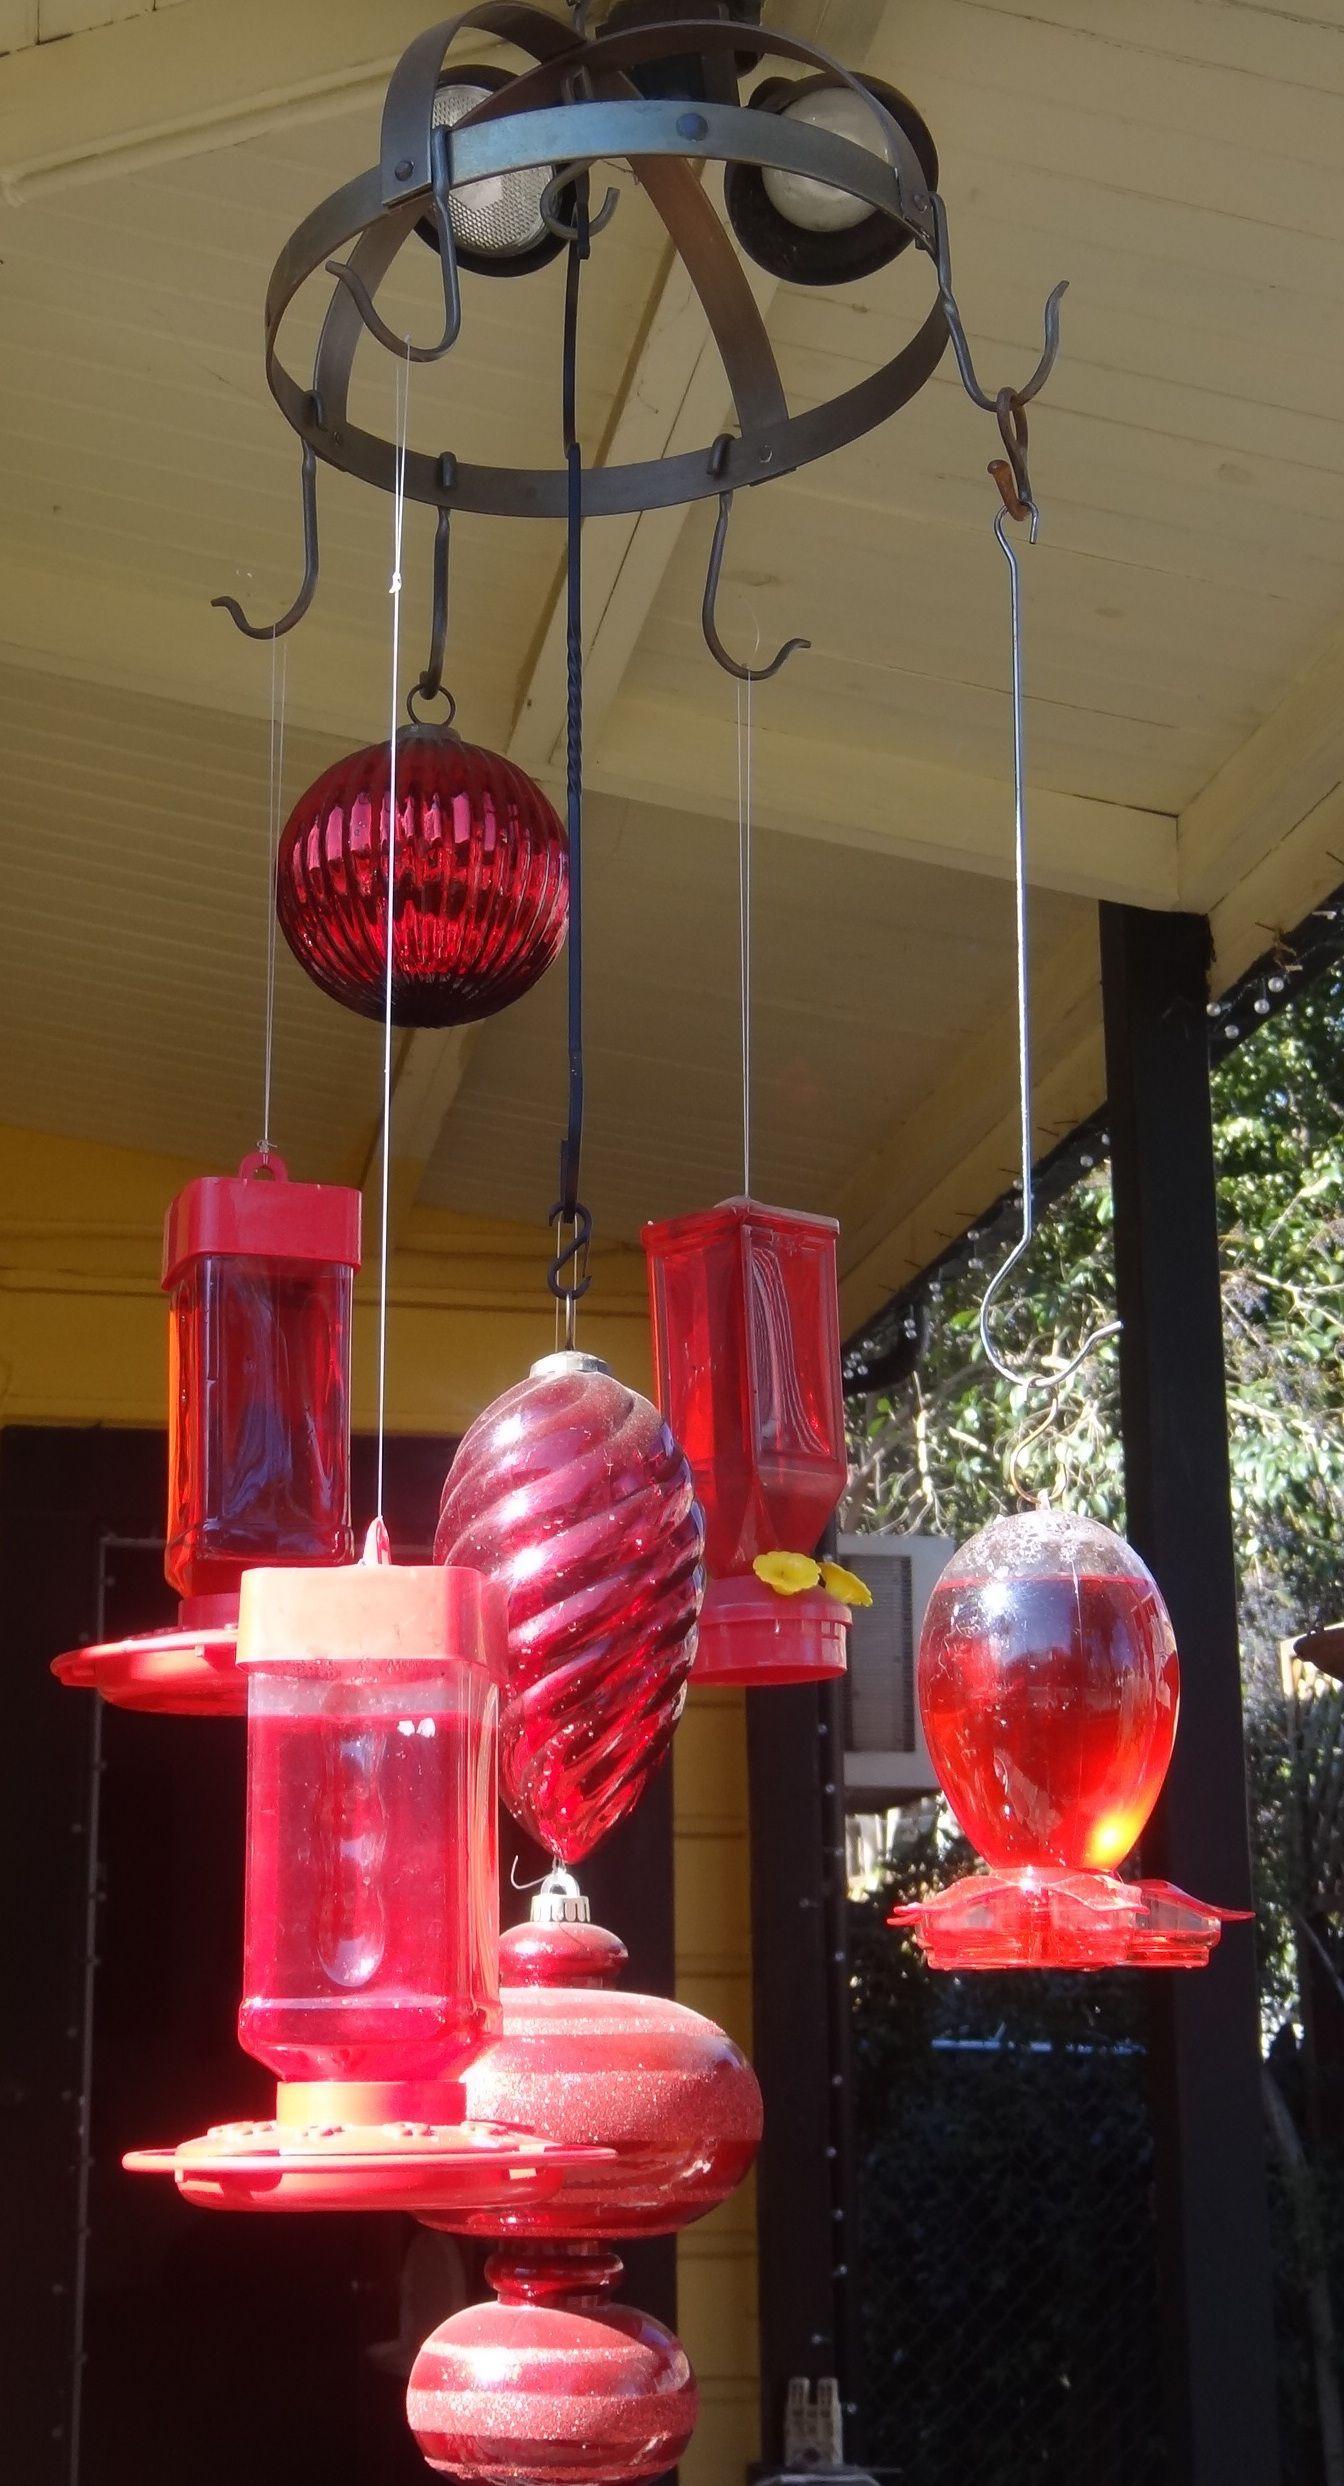 Pin By Mary Marx Laatsch On Thrift Store Finds Humming Bird Feeders Bird Feeder Hangers Diy Bird Feeder